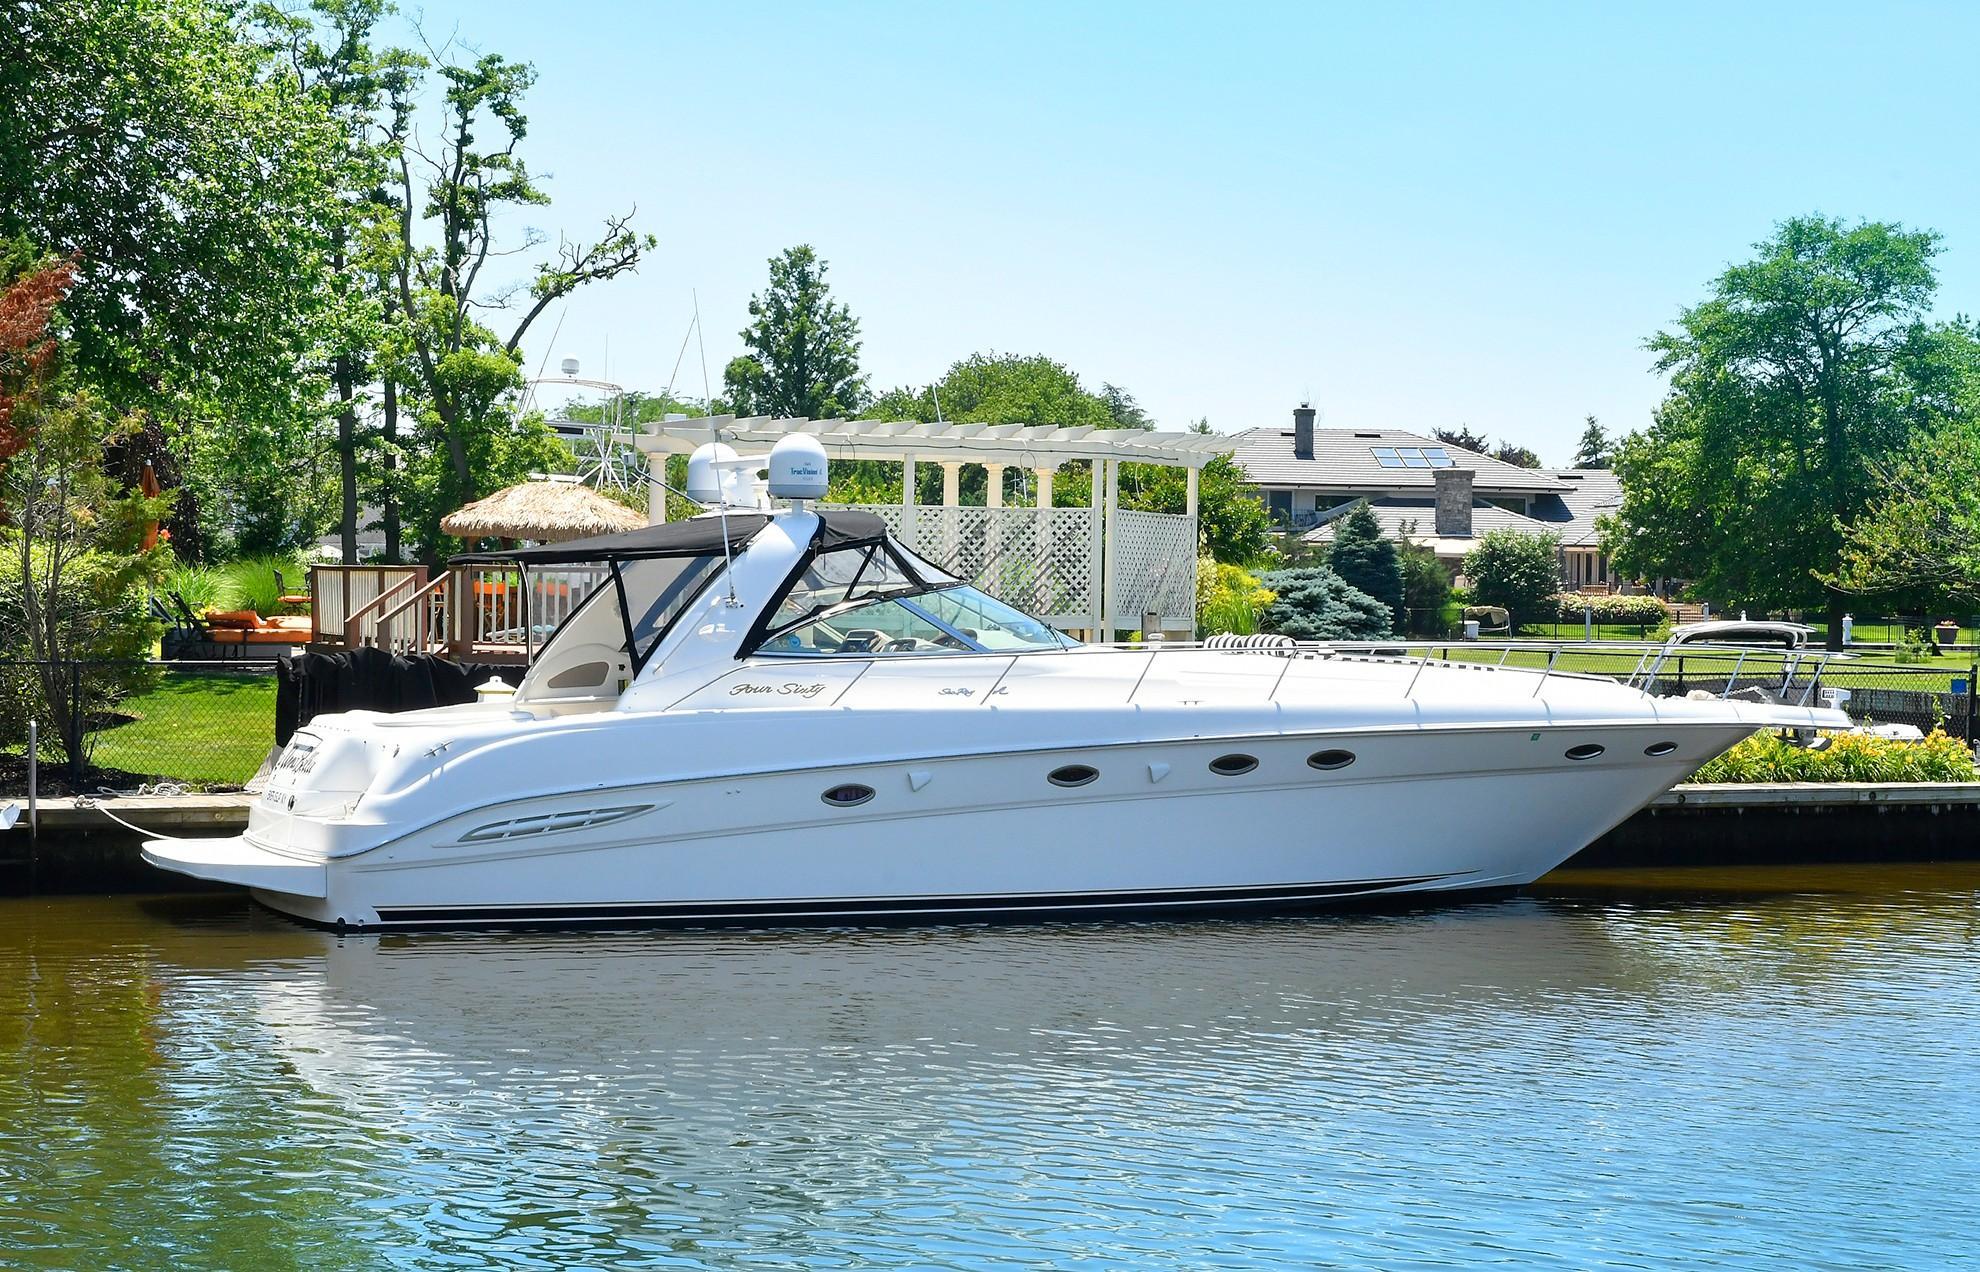 La Anna Bella Yacht For Sale 46 Sea Ray Yachts Babylon Ny Denison Yacht Sales